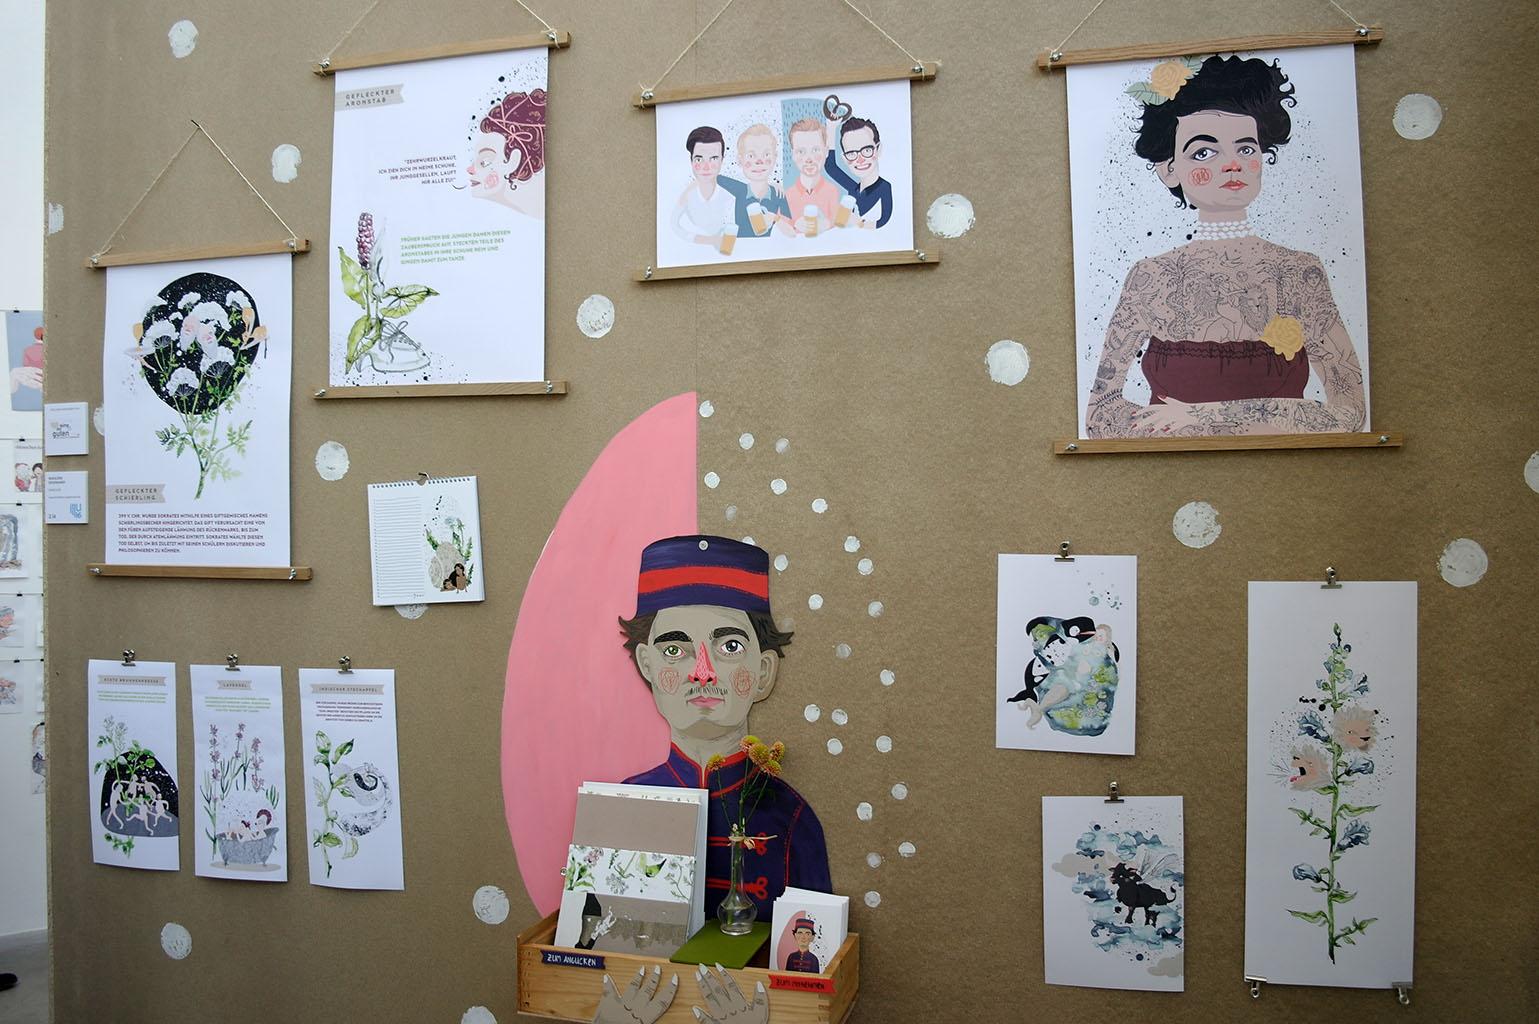 illu16-illustratoren-festival-köln-bauchladen-pflanze-hans-christian-sanladerer